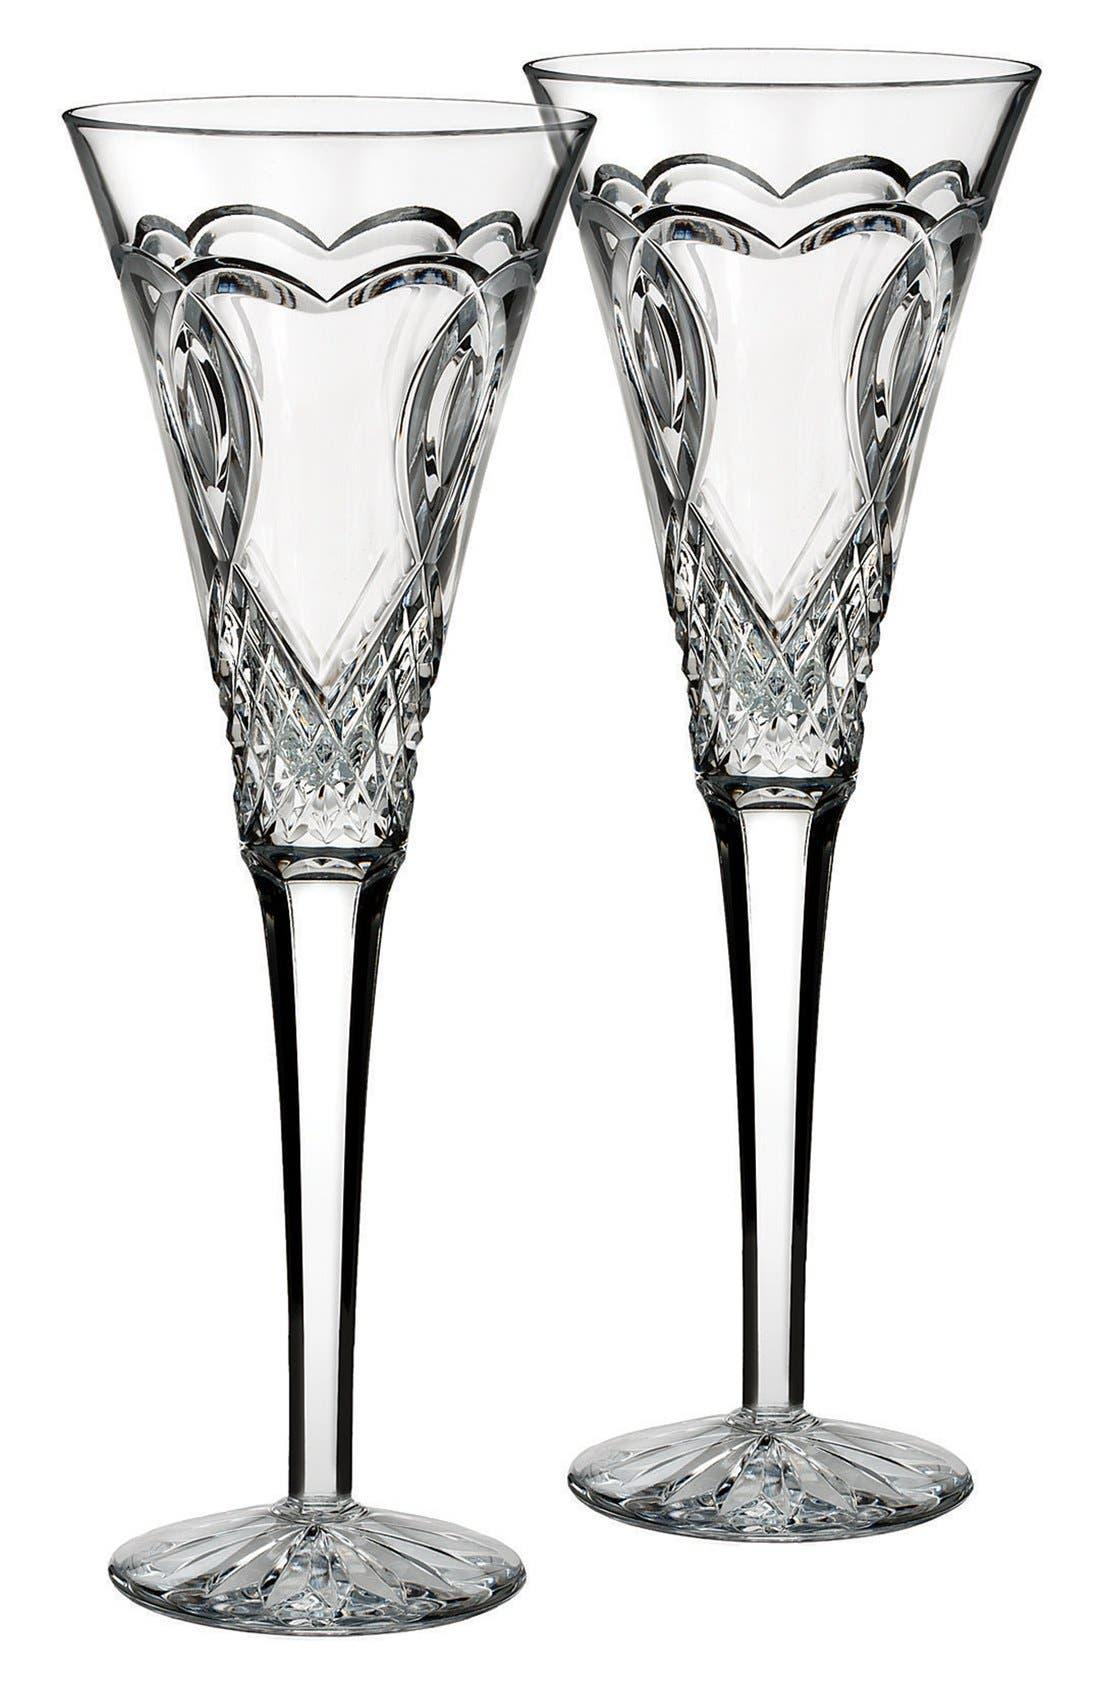 Main Image - Waterford 'Wedding' Lead Crystal Toasting Flutes (Set of 2)